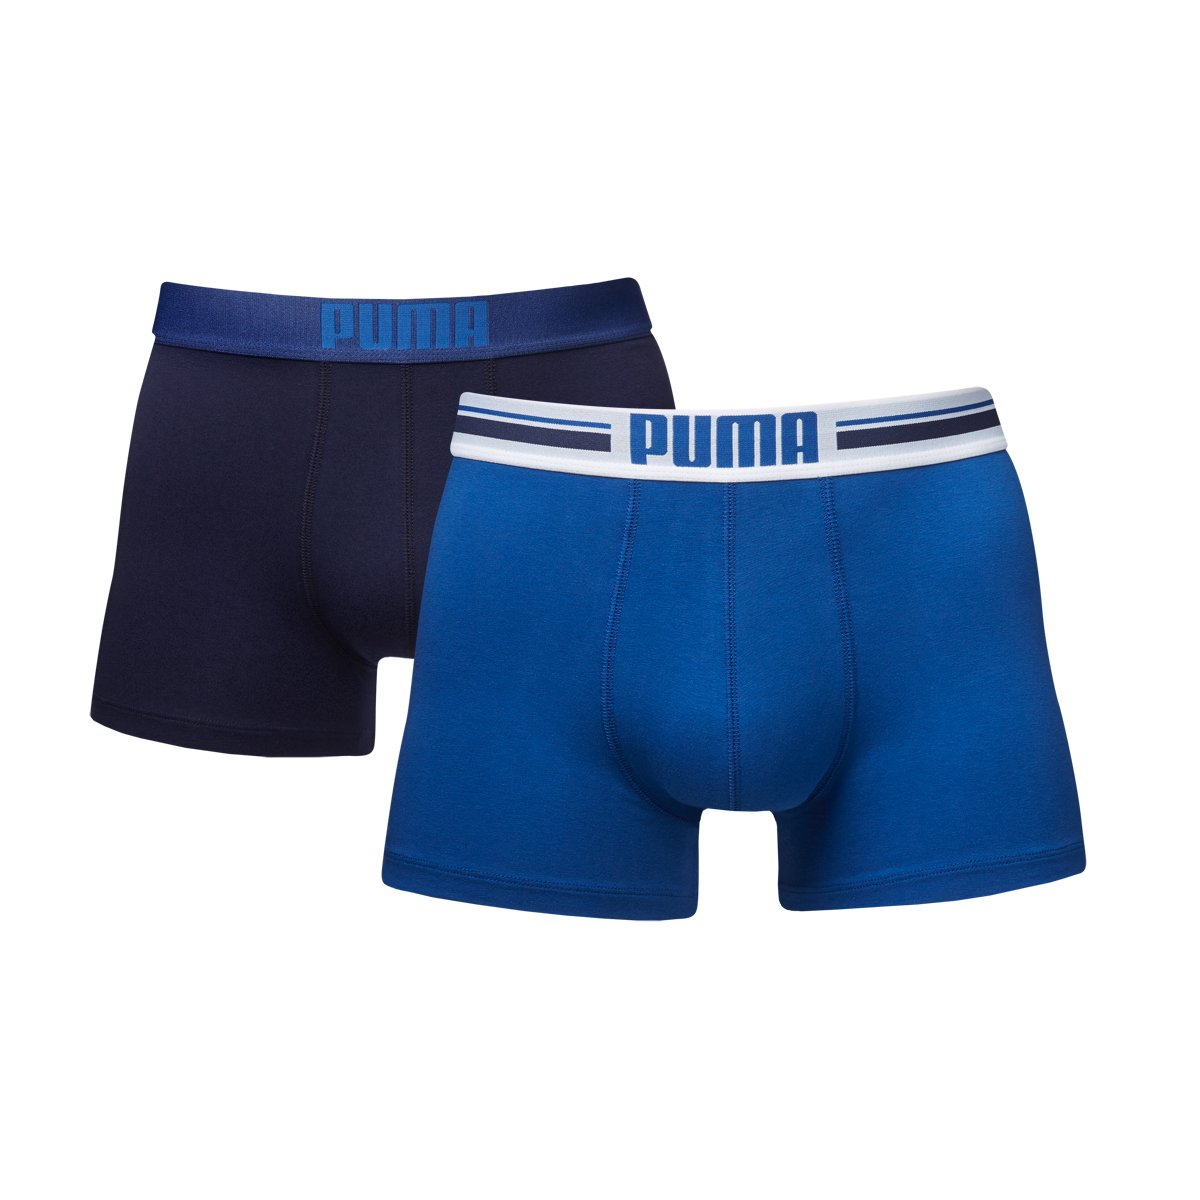 TALLA M. Puma Placed Logo - Pack de 2 bóxers para hombre